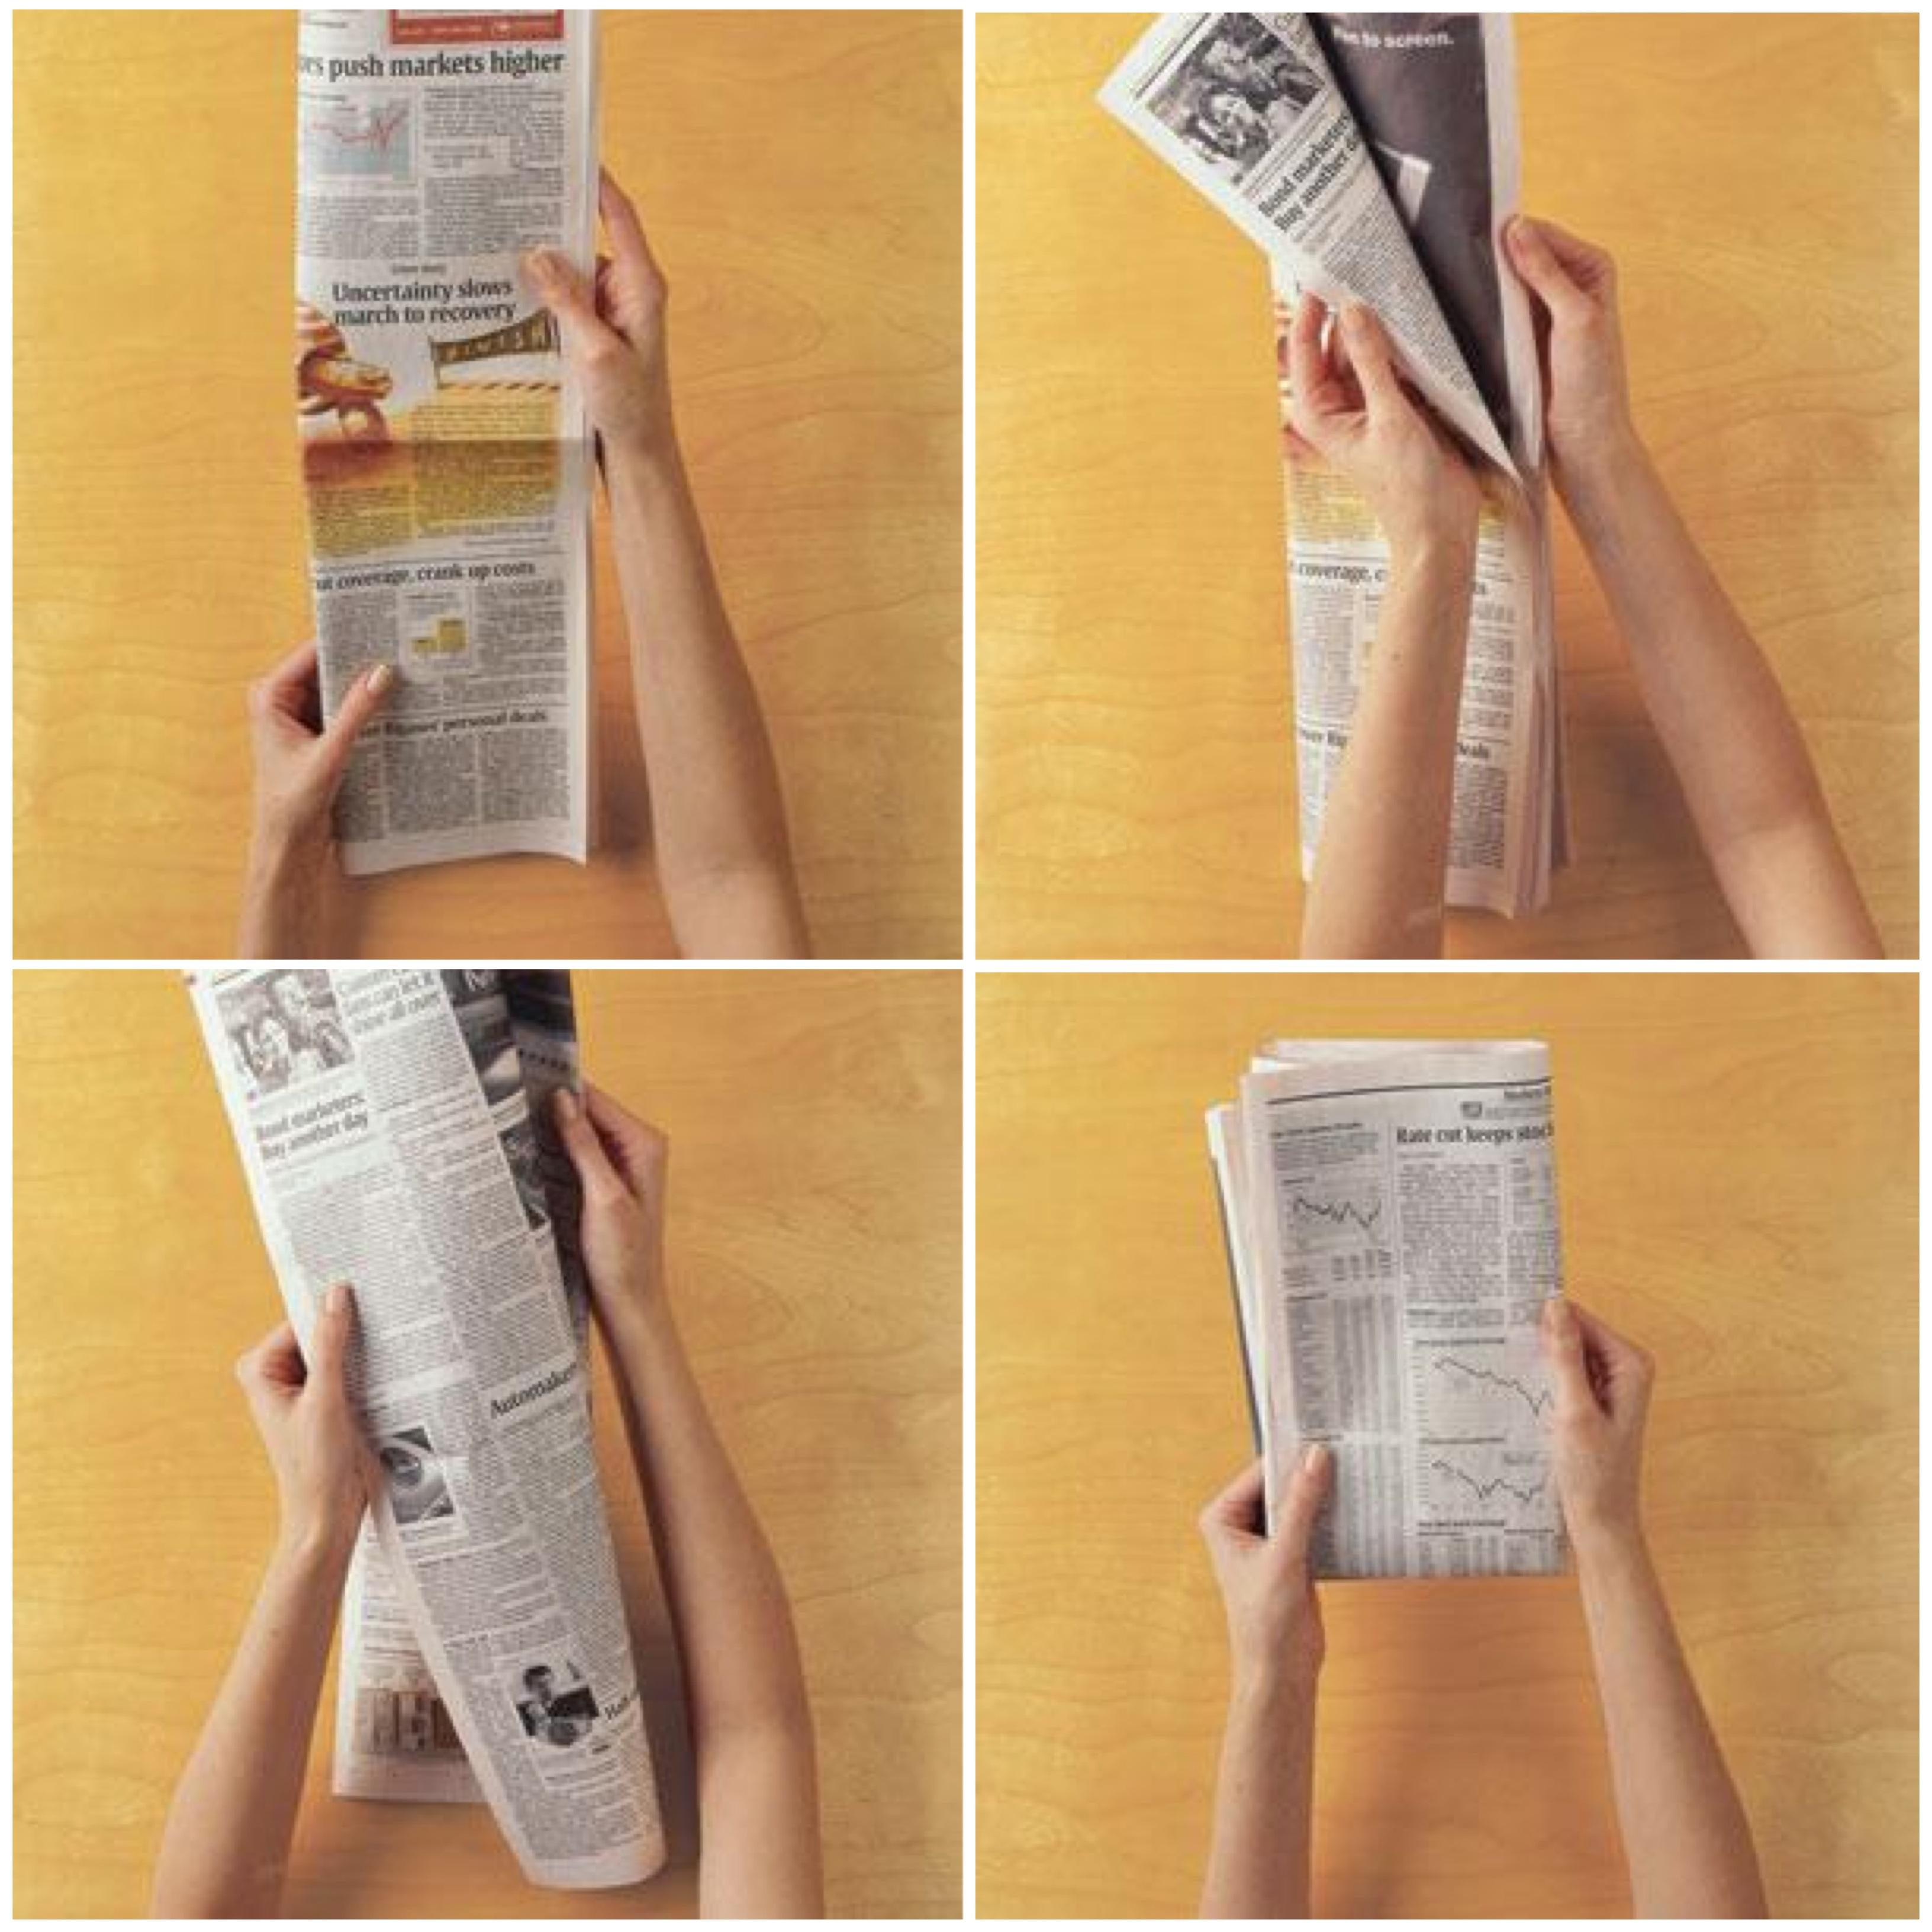 Newspaper Newspaper Styles Broadsheet